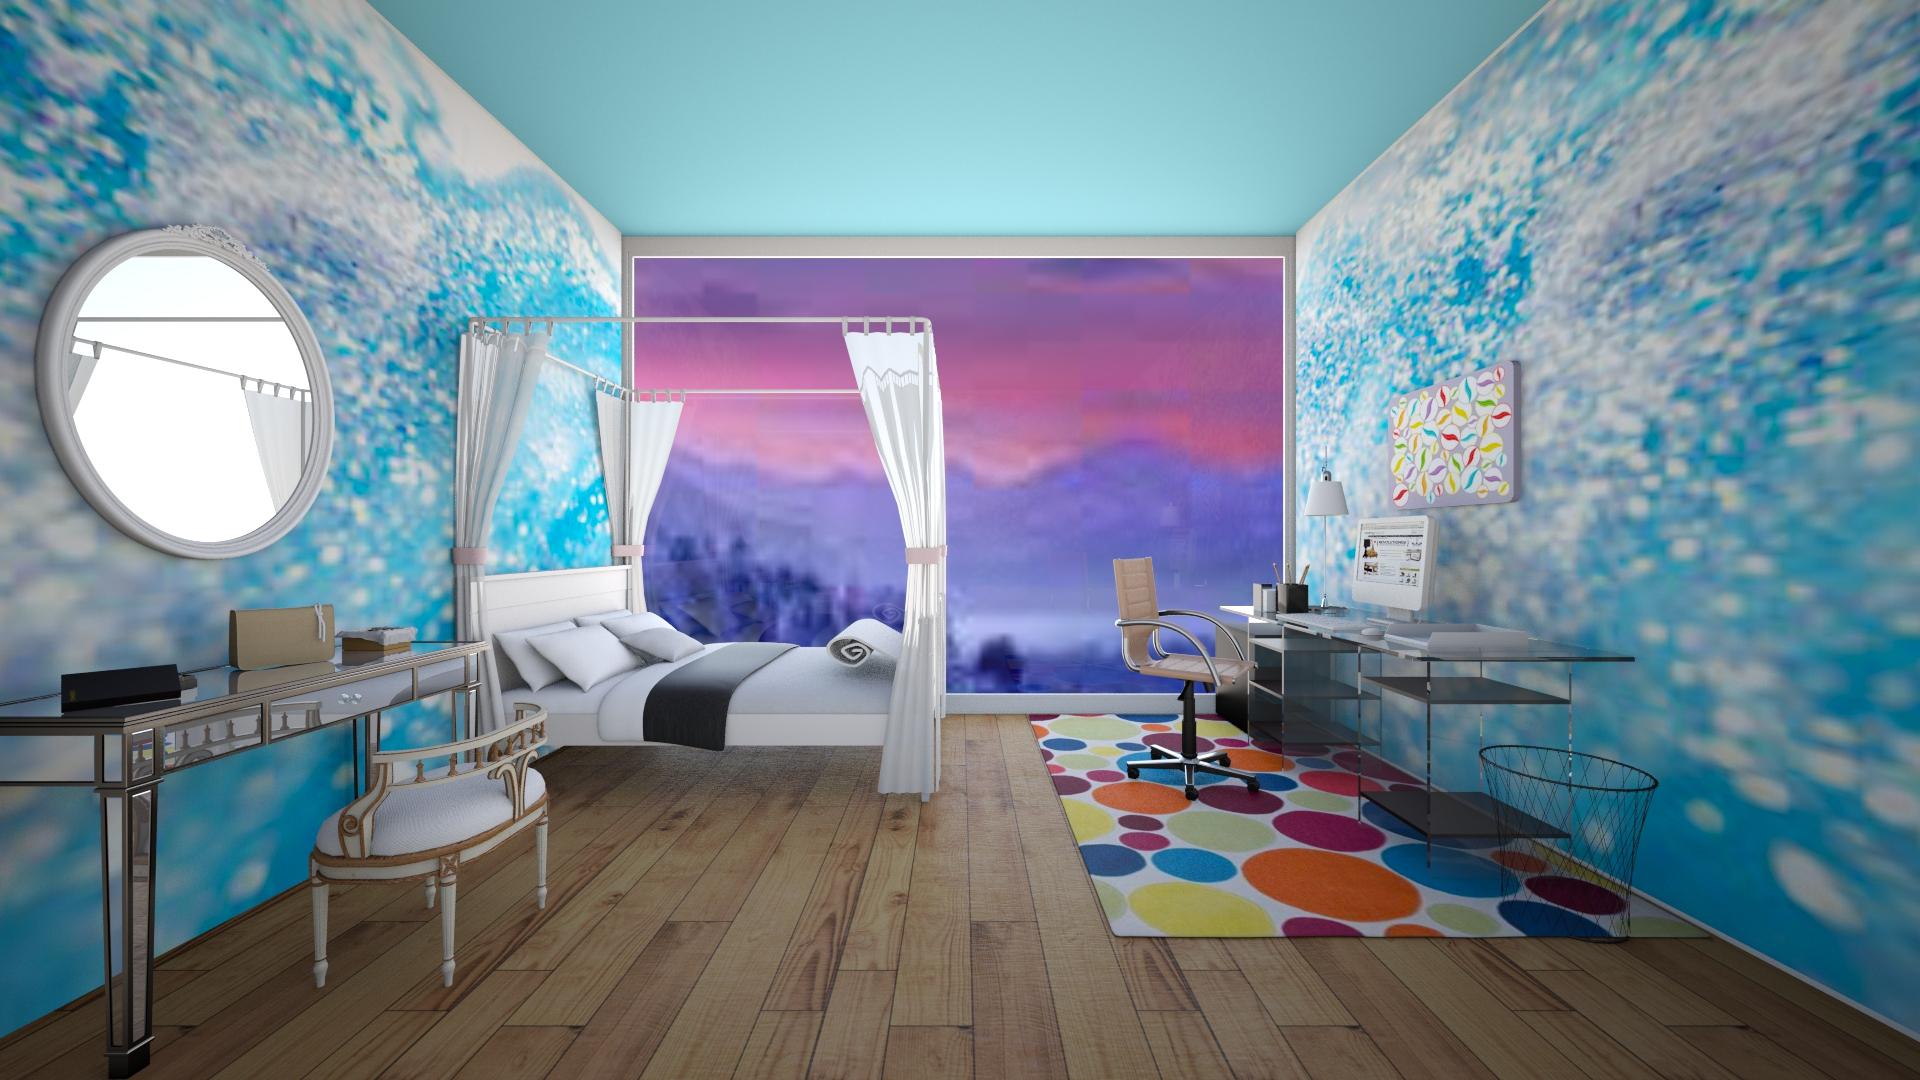 Teen Girls Dream Room - Kids room - by awsompaws